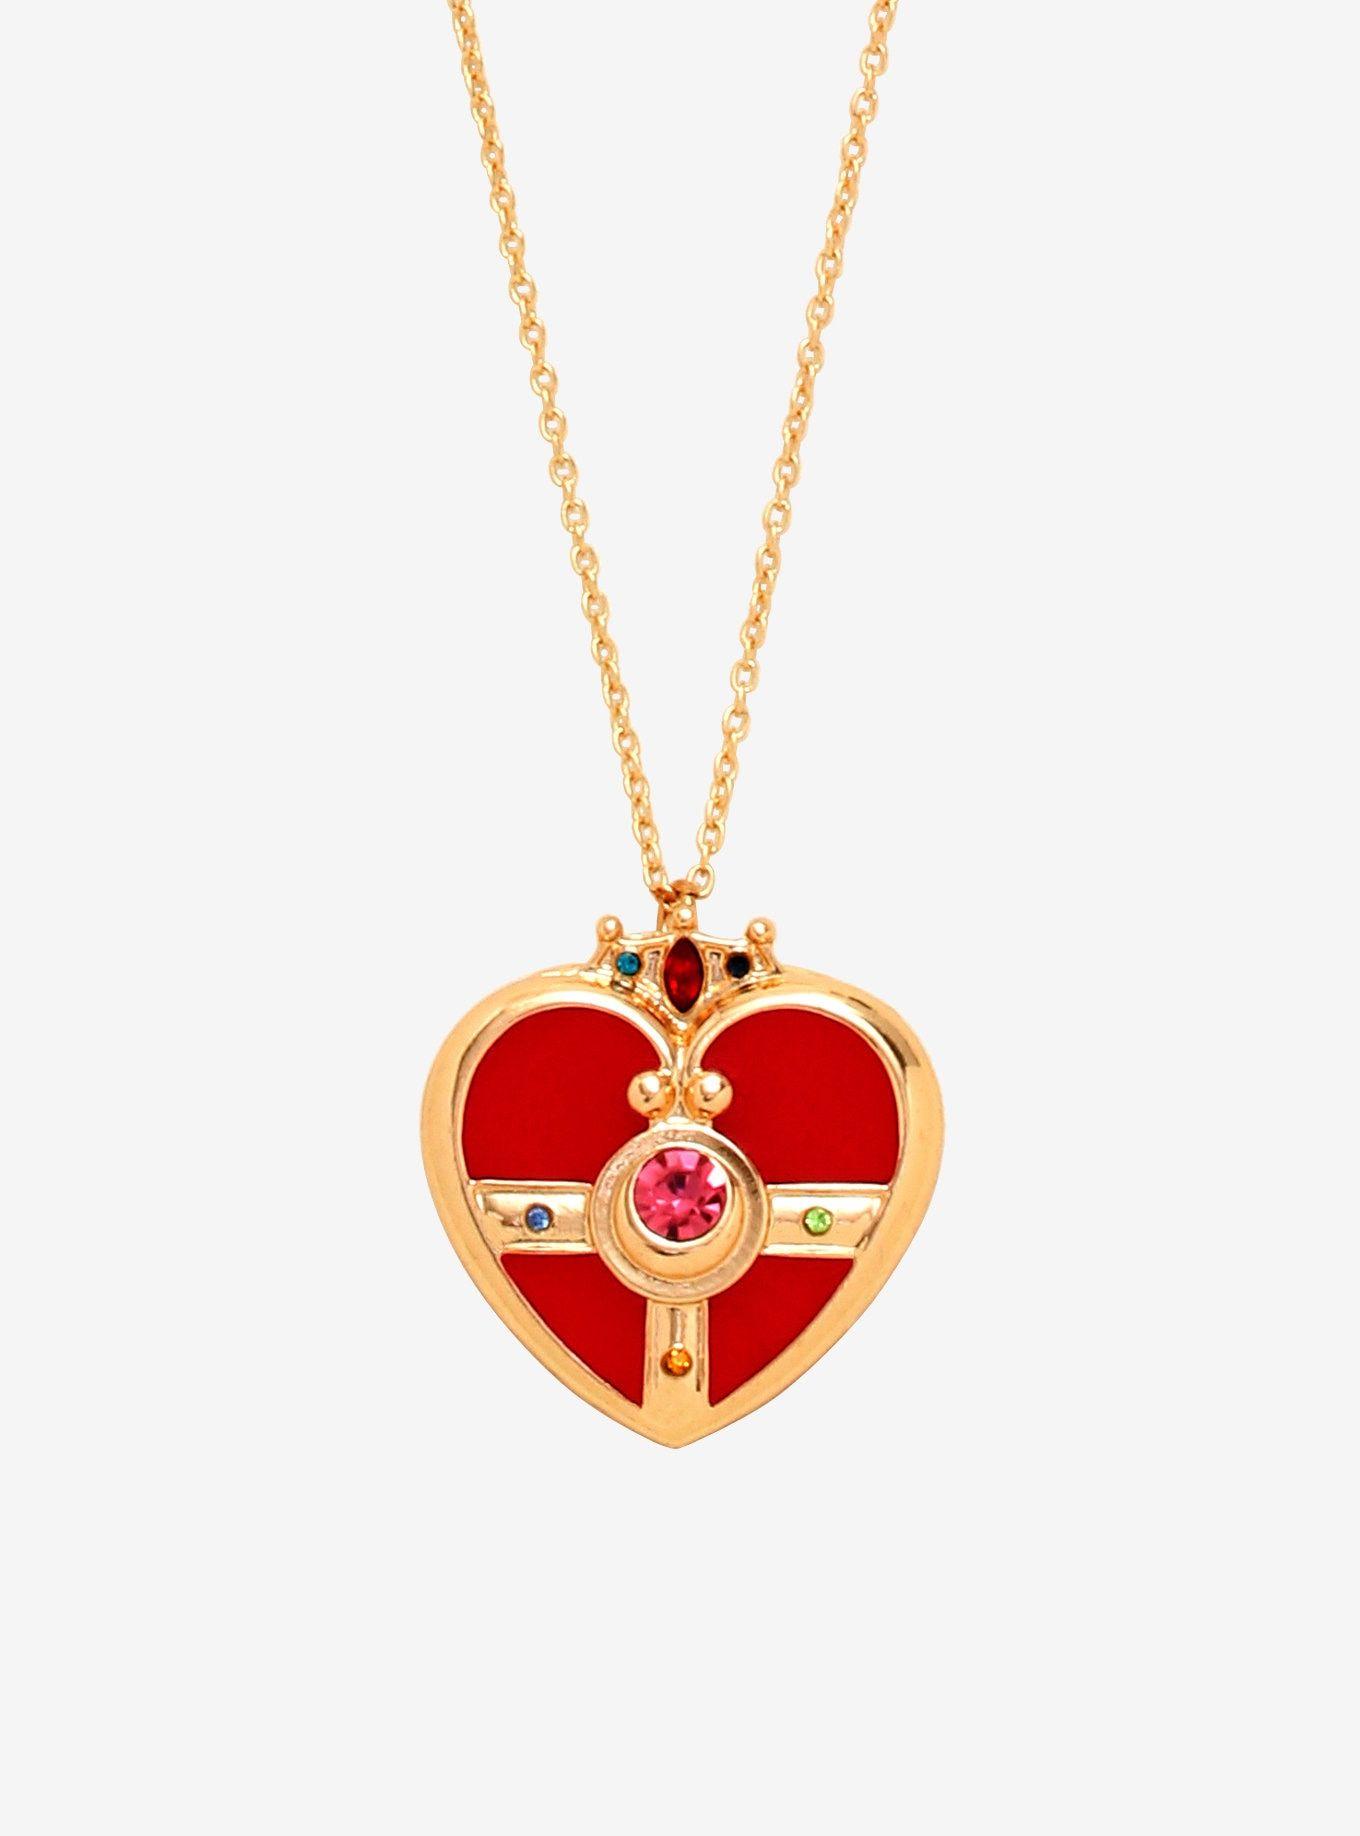 Sailor Moon Cosmic Heart Compact Locket Necklace